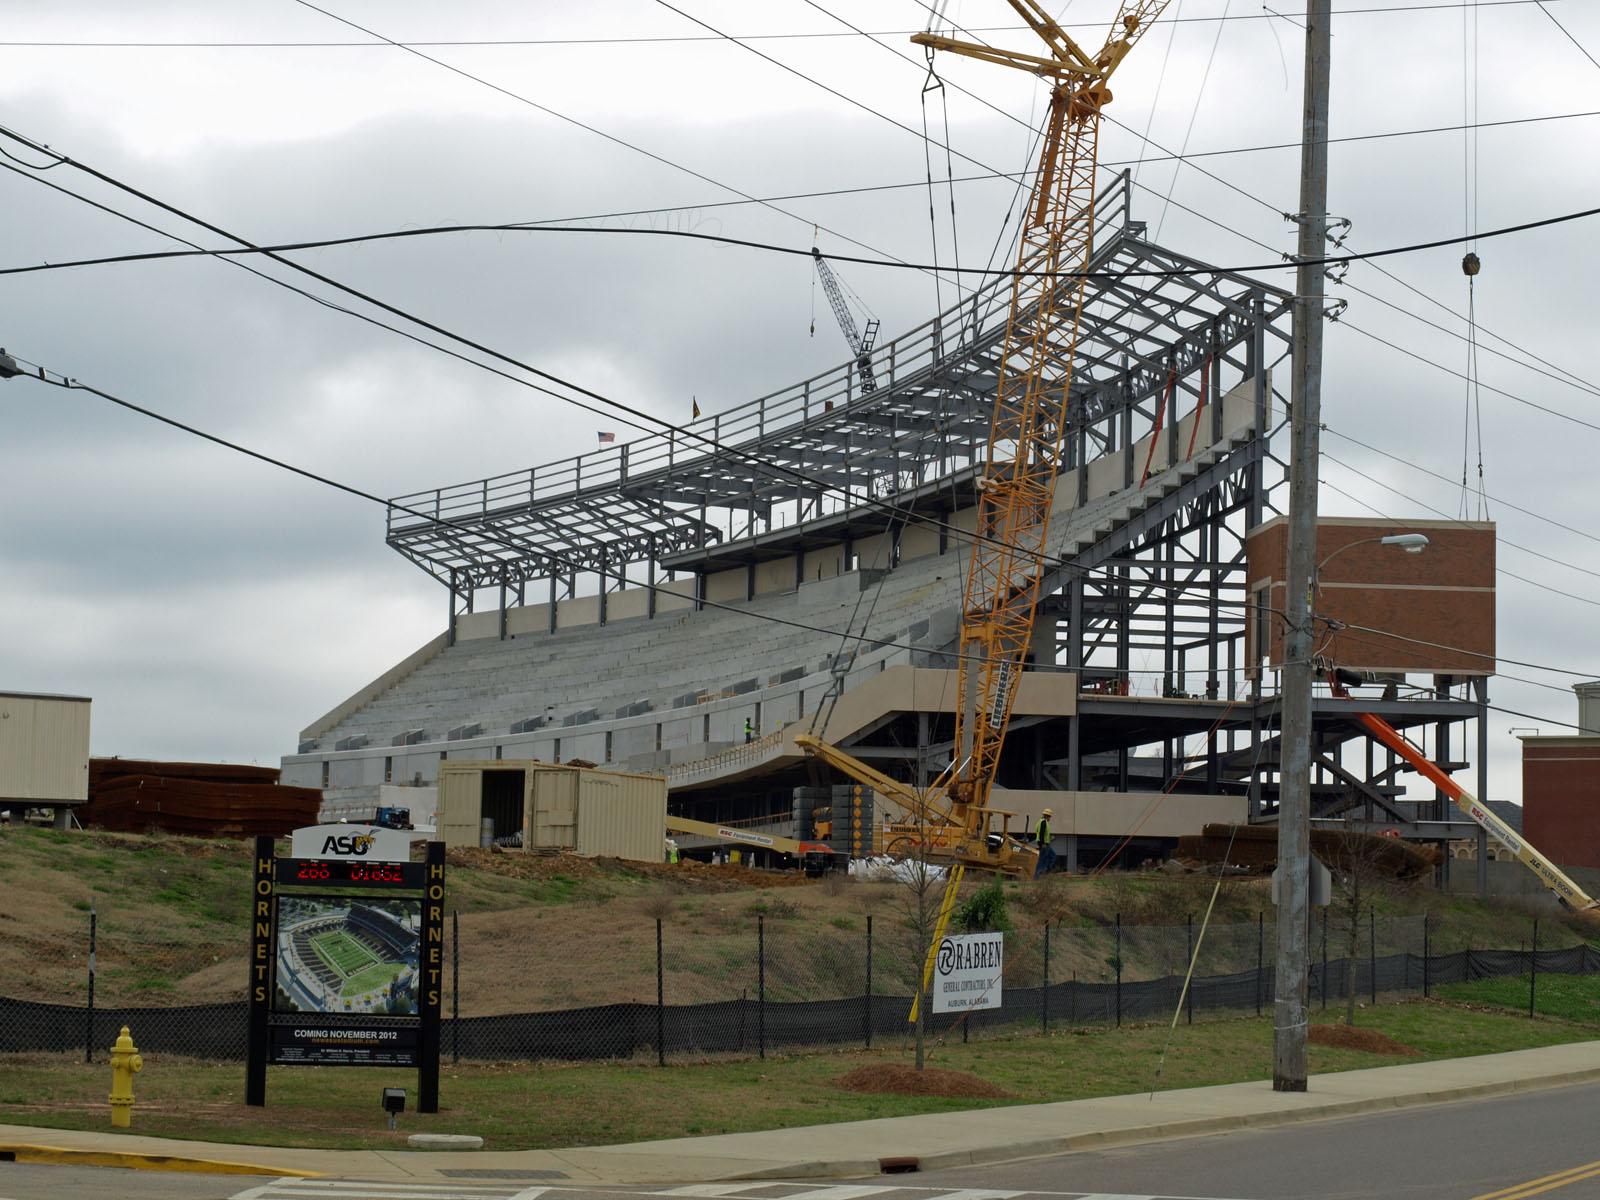 Terry frei csu has no good choice but to build new football stadium